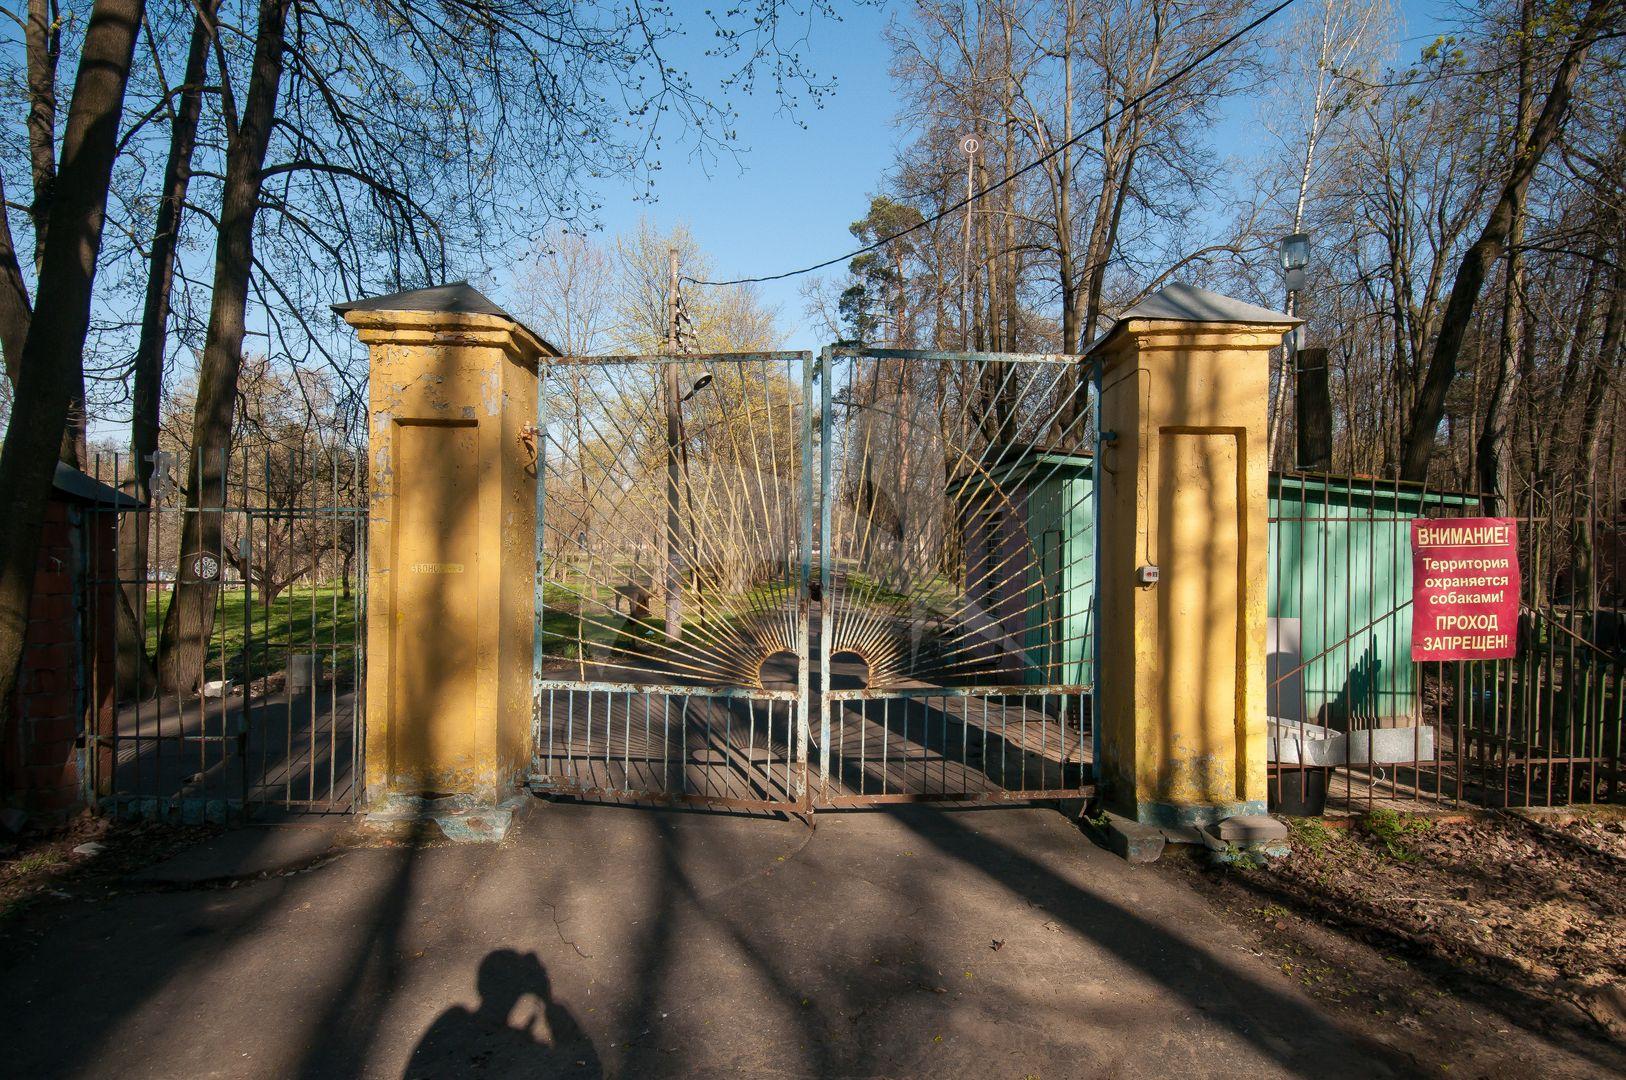 Ворота и ограда, нач. XIX в., усадьба «Чижово»